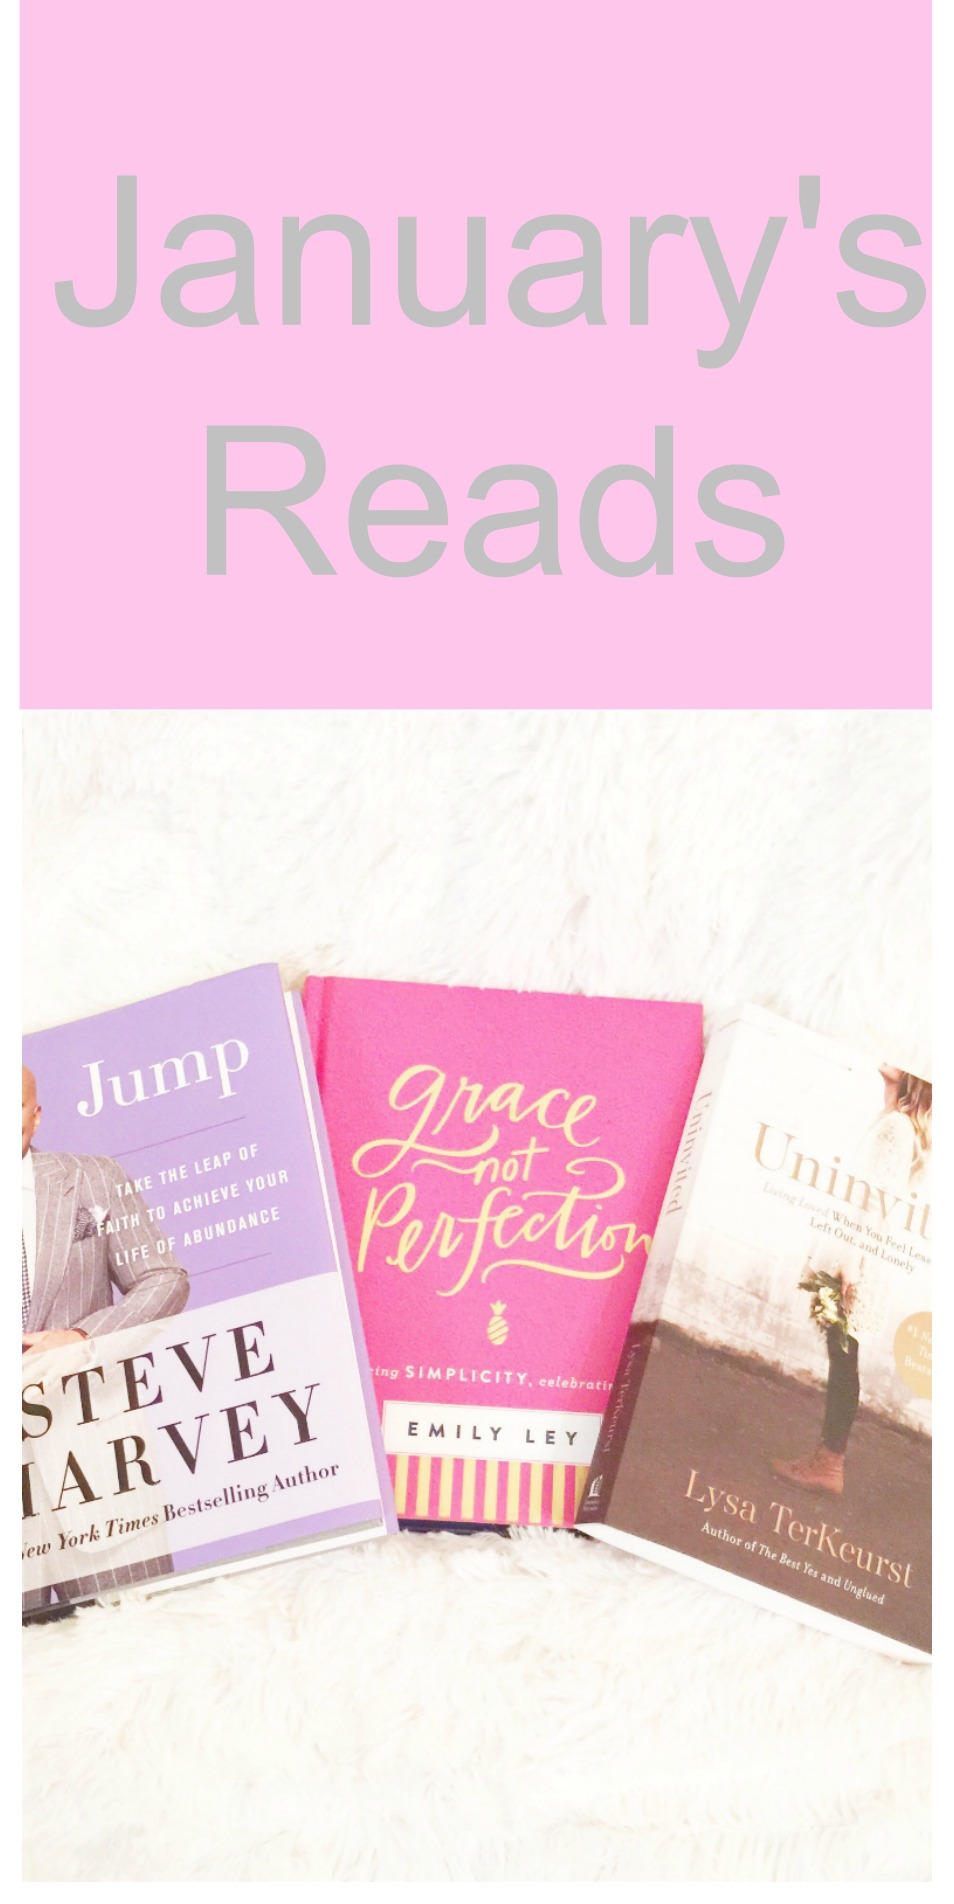 januarys-reads-4